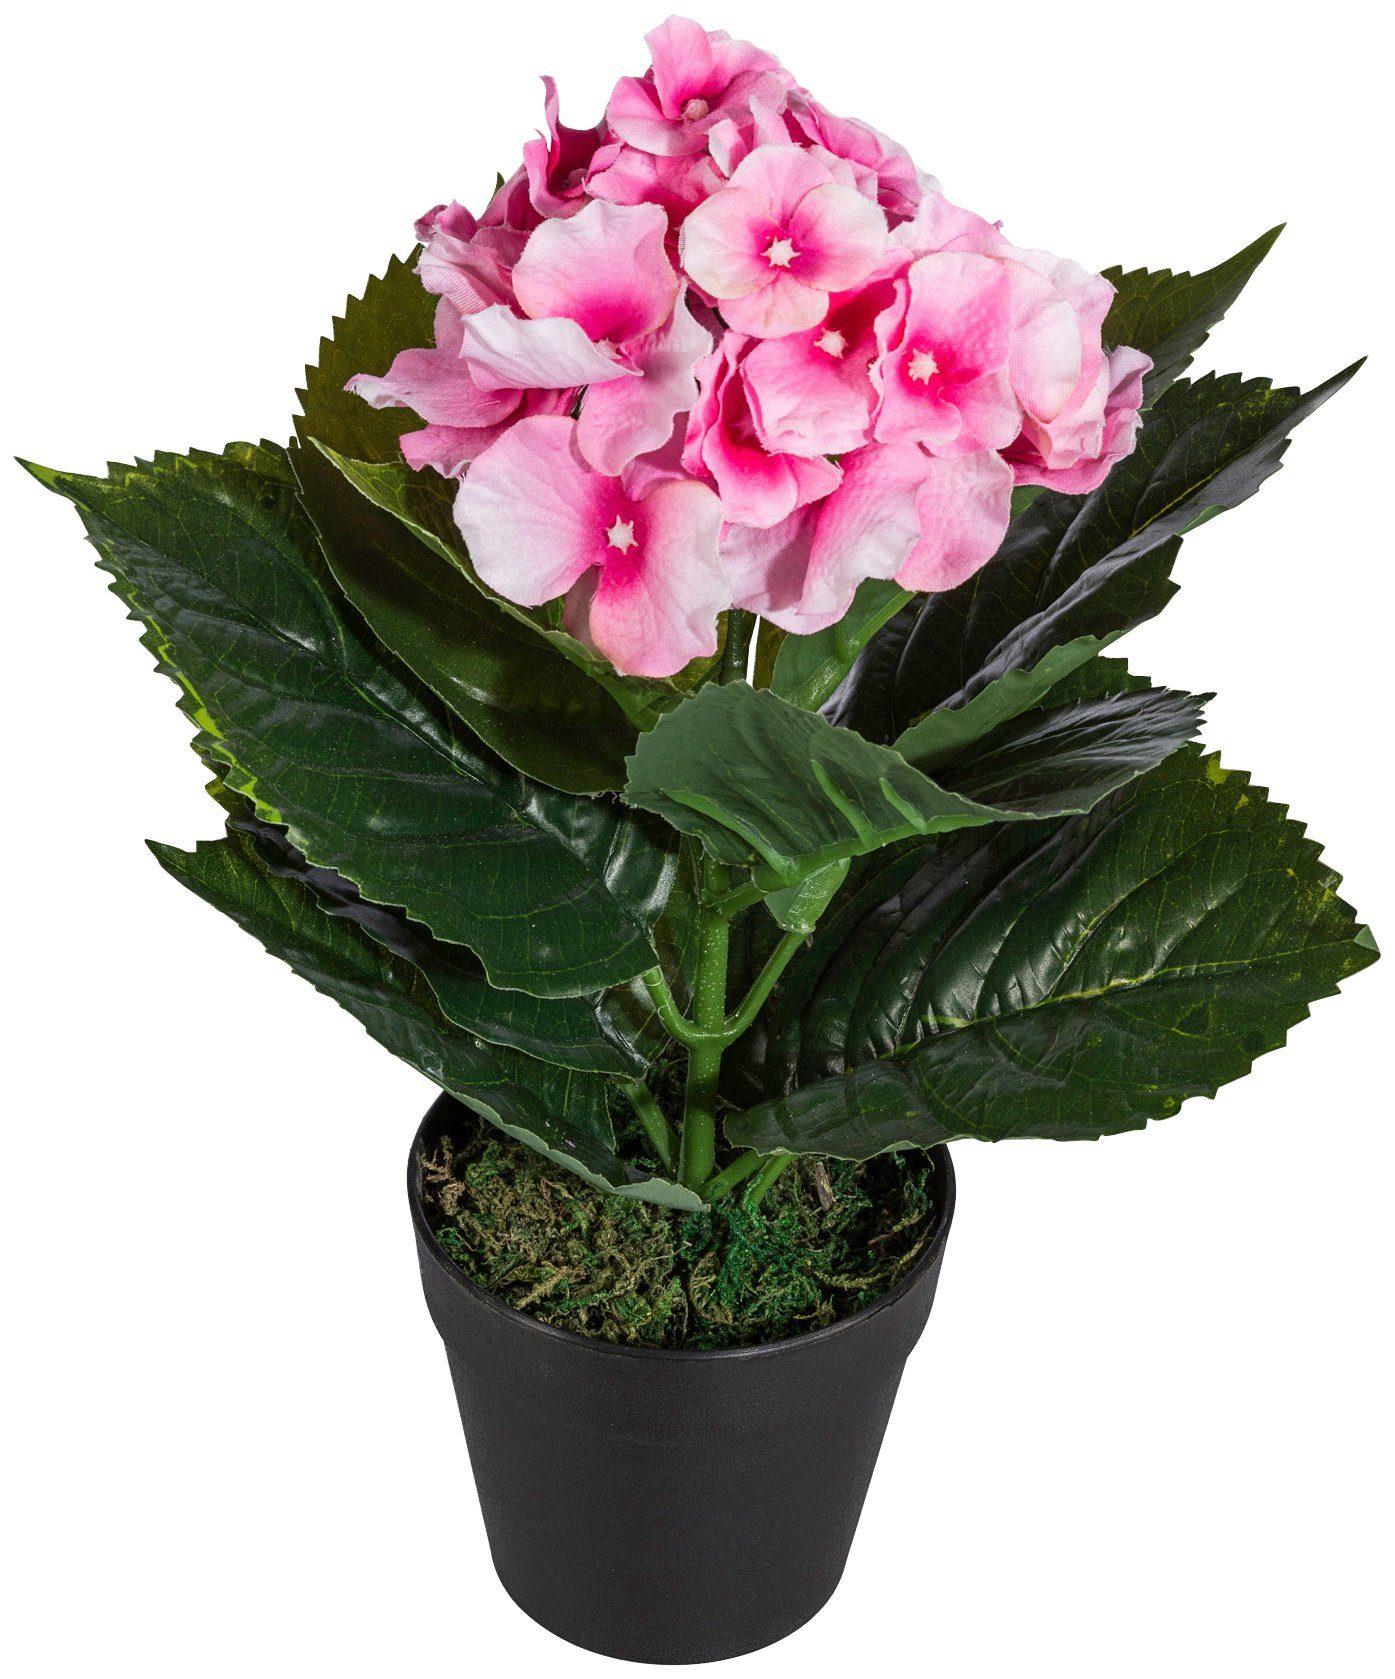 Kunstpflanze »Hortensie«, im Kunststofftopf, H: 30 cm, rosa